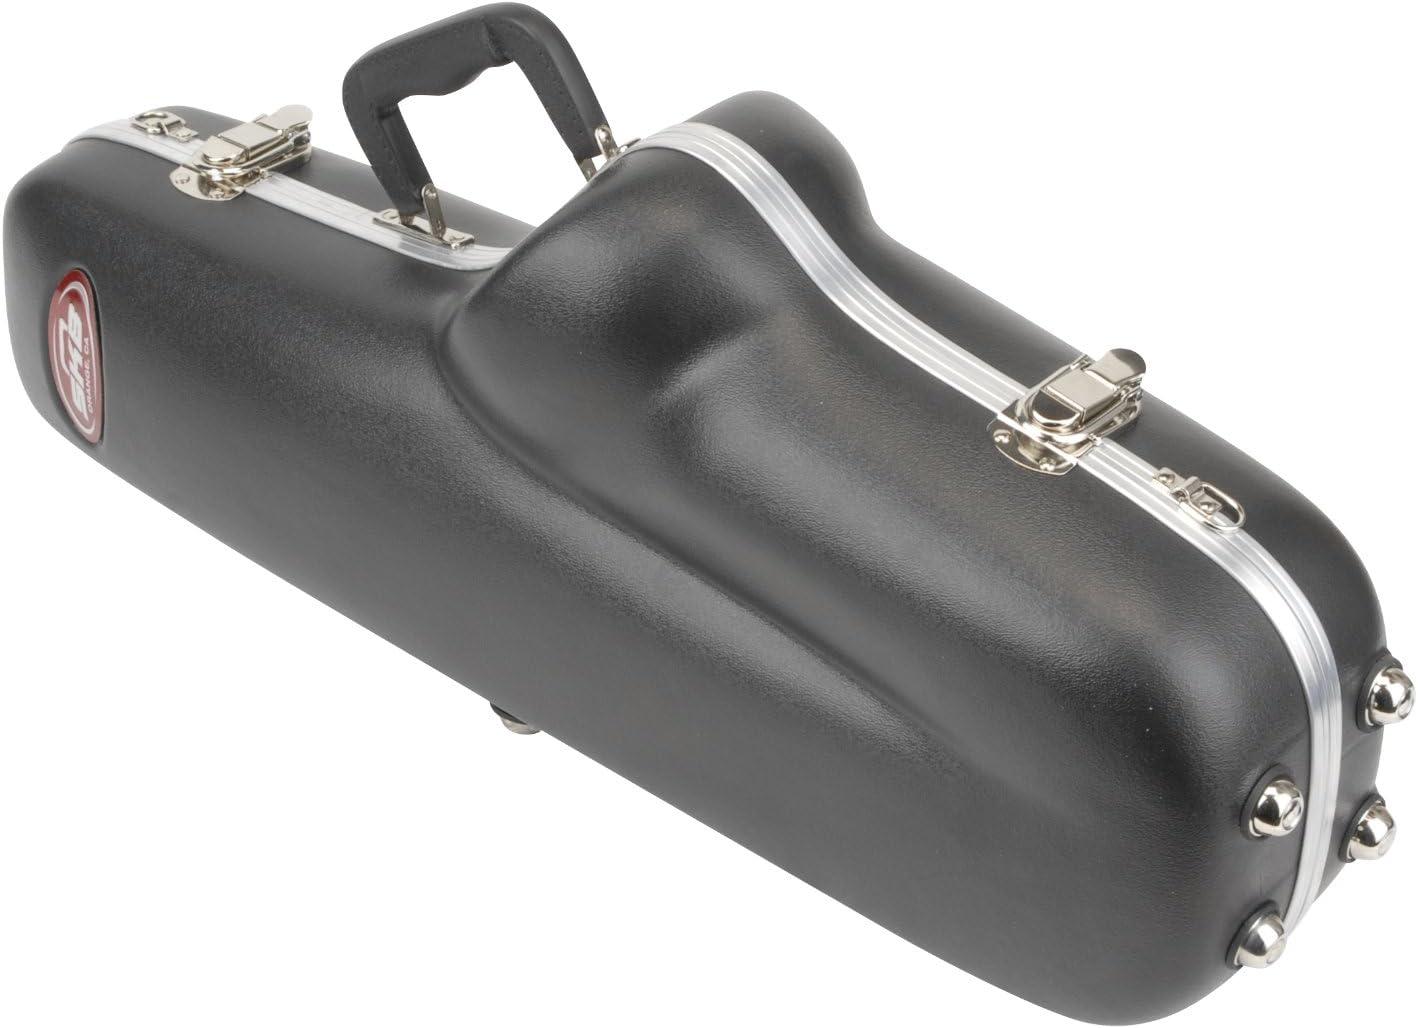 SKB 1SKB-140 - Maleta contorneada para saxo alto: Amazon.es: Instrumentos musicales